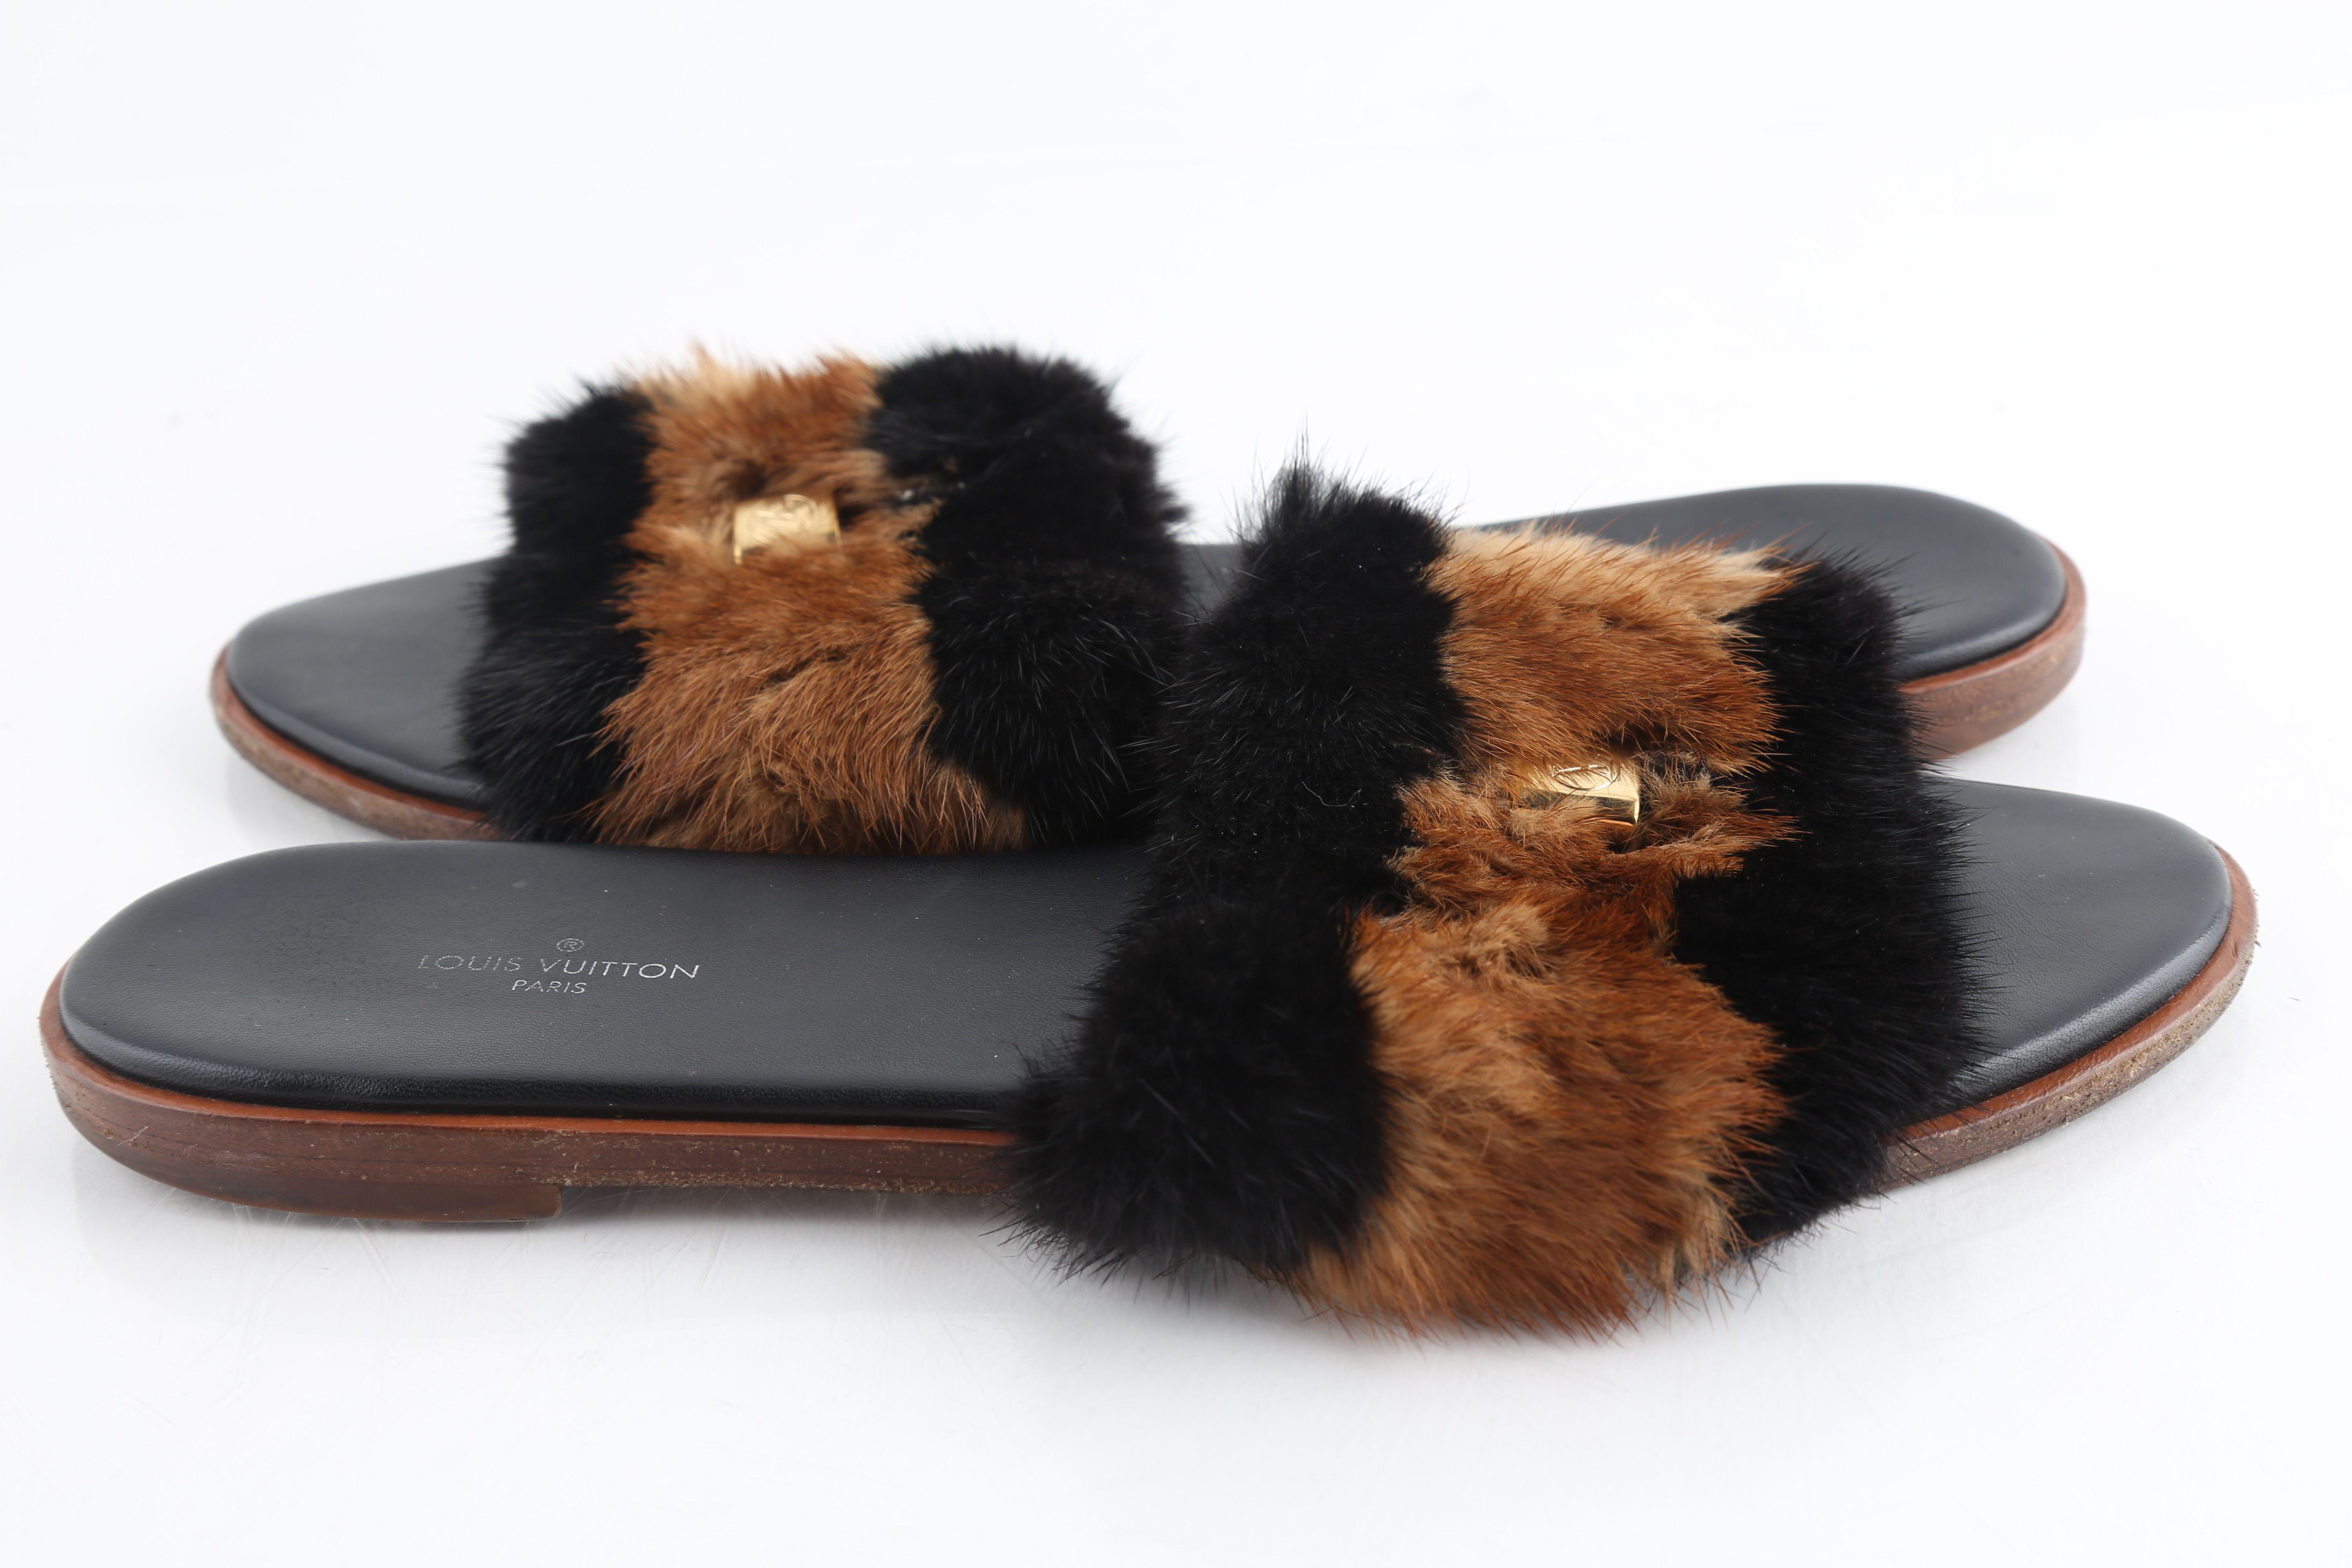 louis vuitton fur slippers